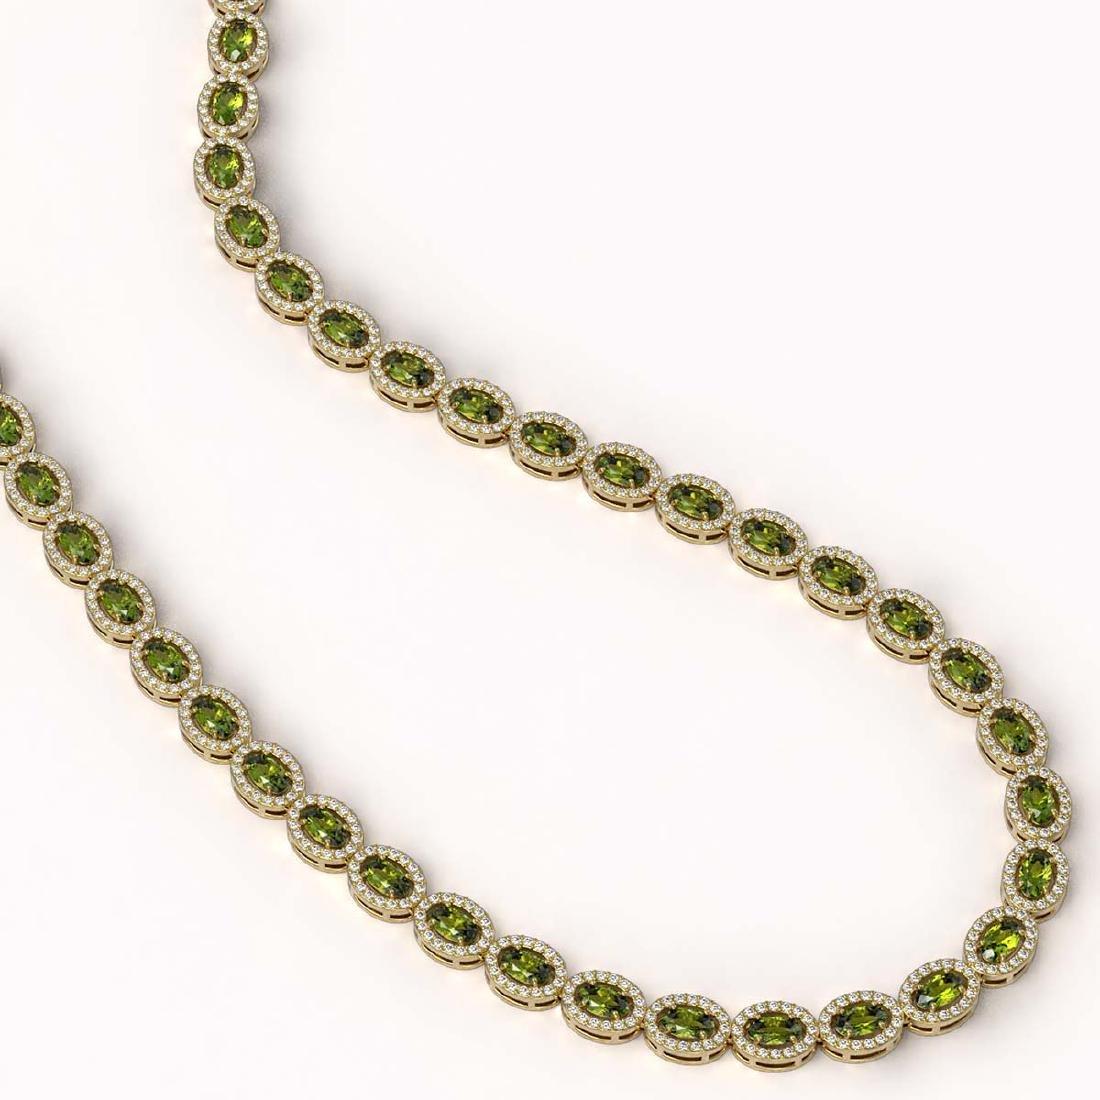 23.57 CTW Tourmaline & Diamond Halo Necklace 10K Yellow - 2